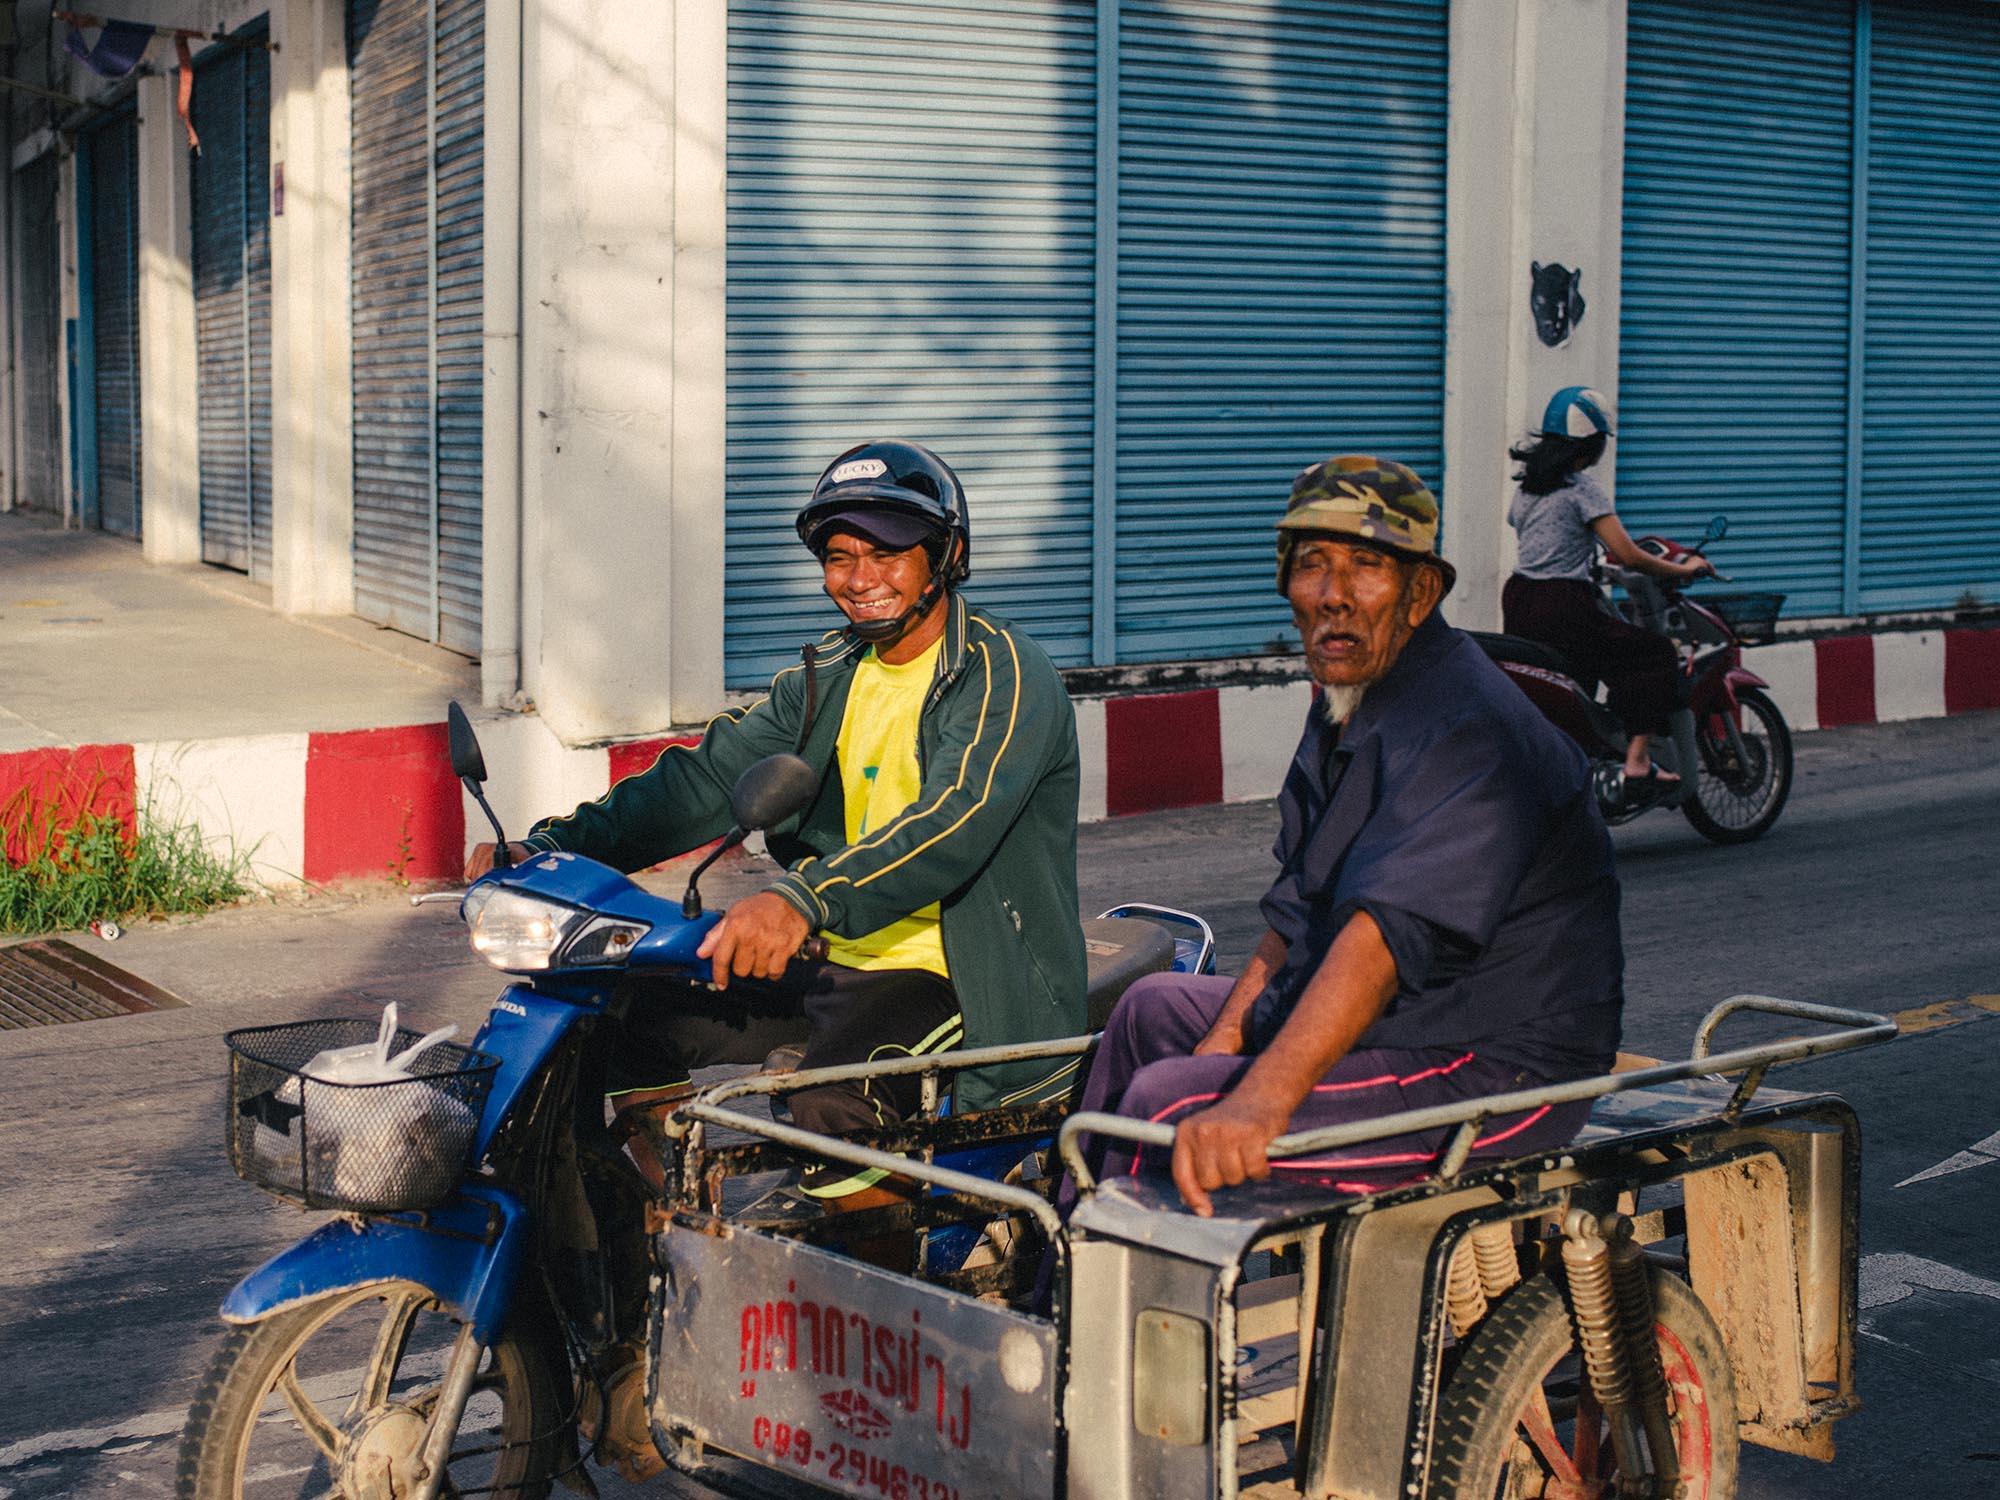 Street photo, Thailand.